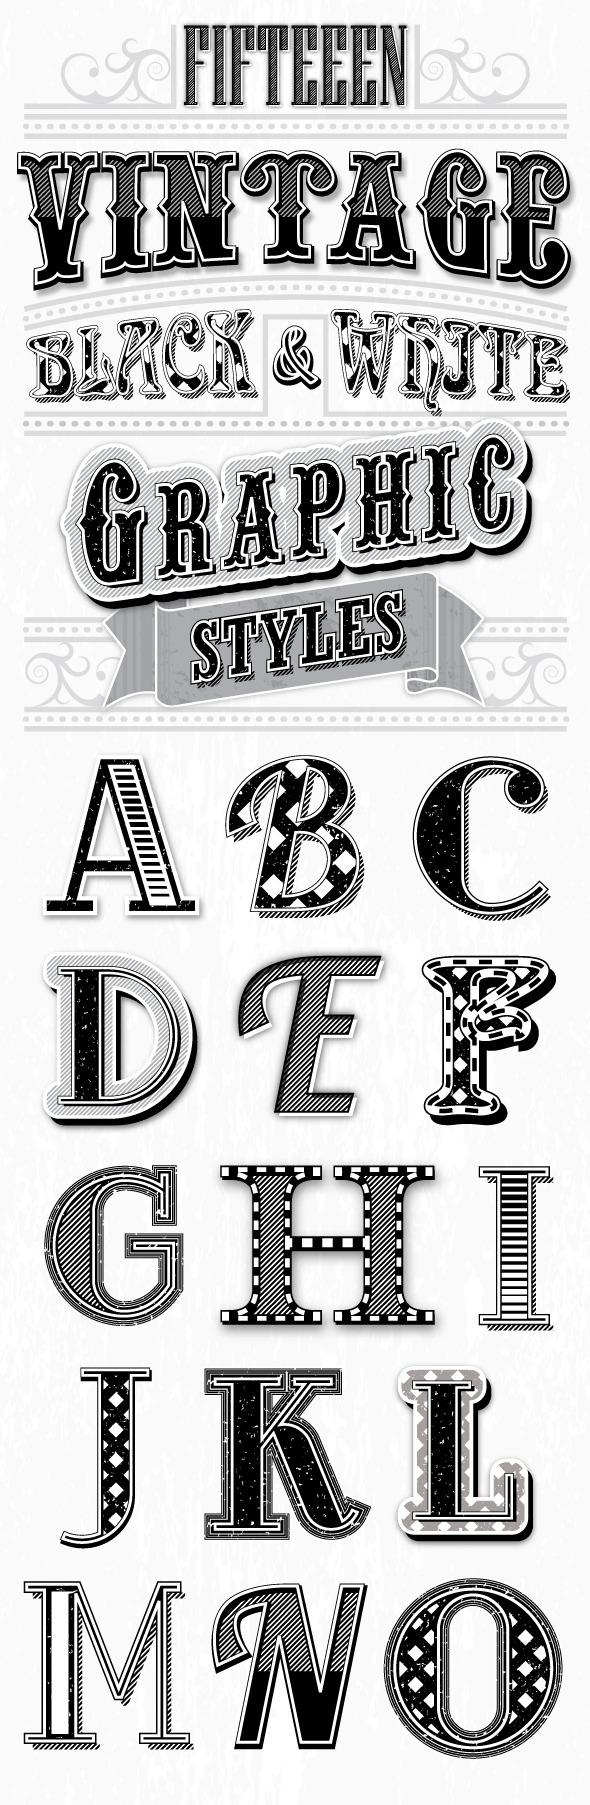 vintage_style